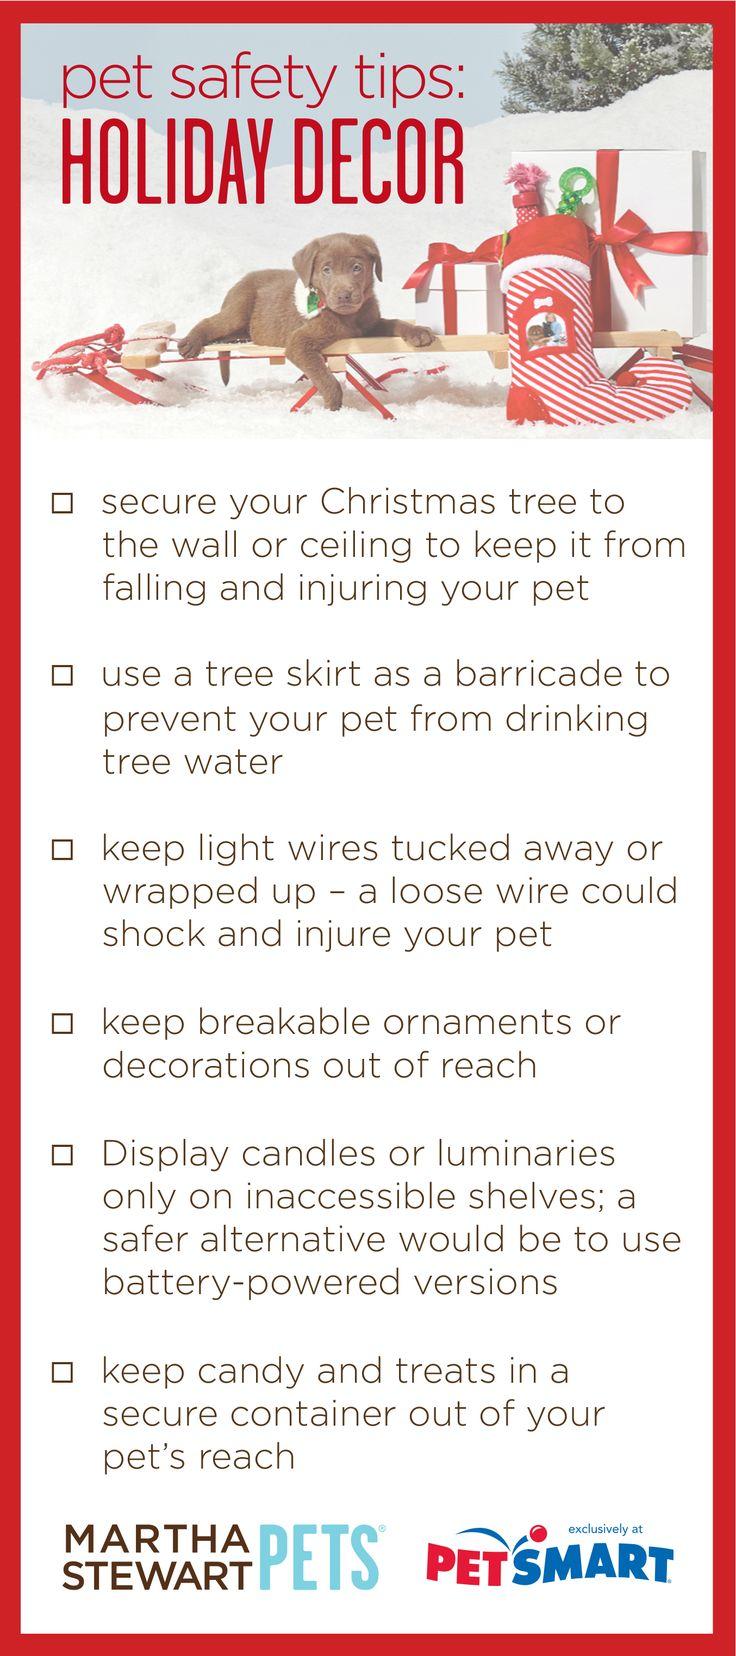 Holiday Pet Safety: Holiday Decor | #marthastewartpets @petsmartcorp #petcare #pettips #petsafety